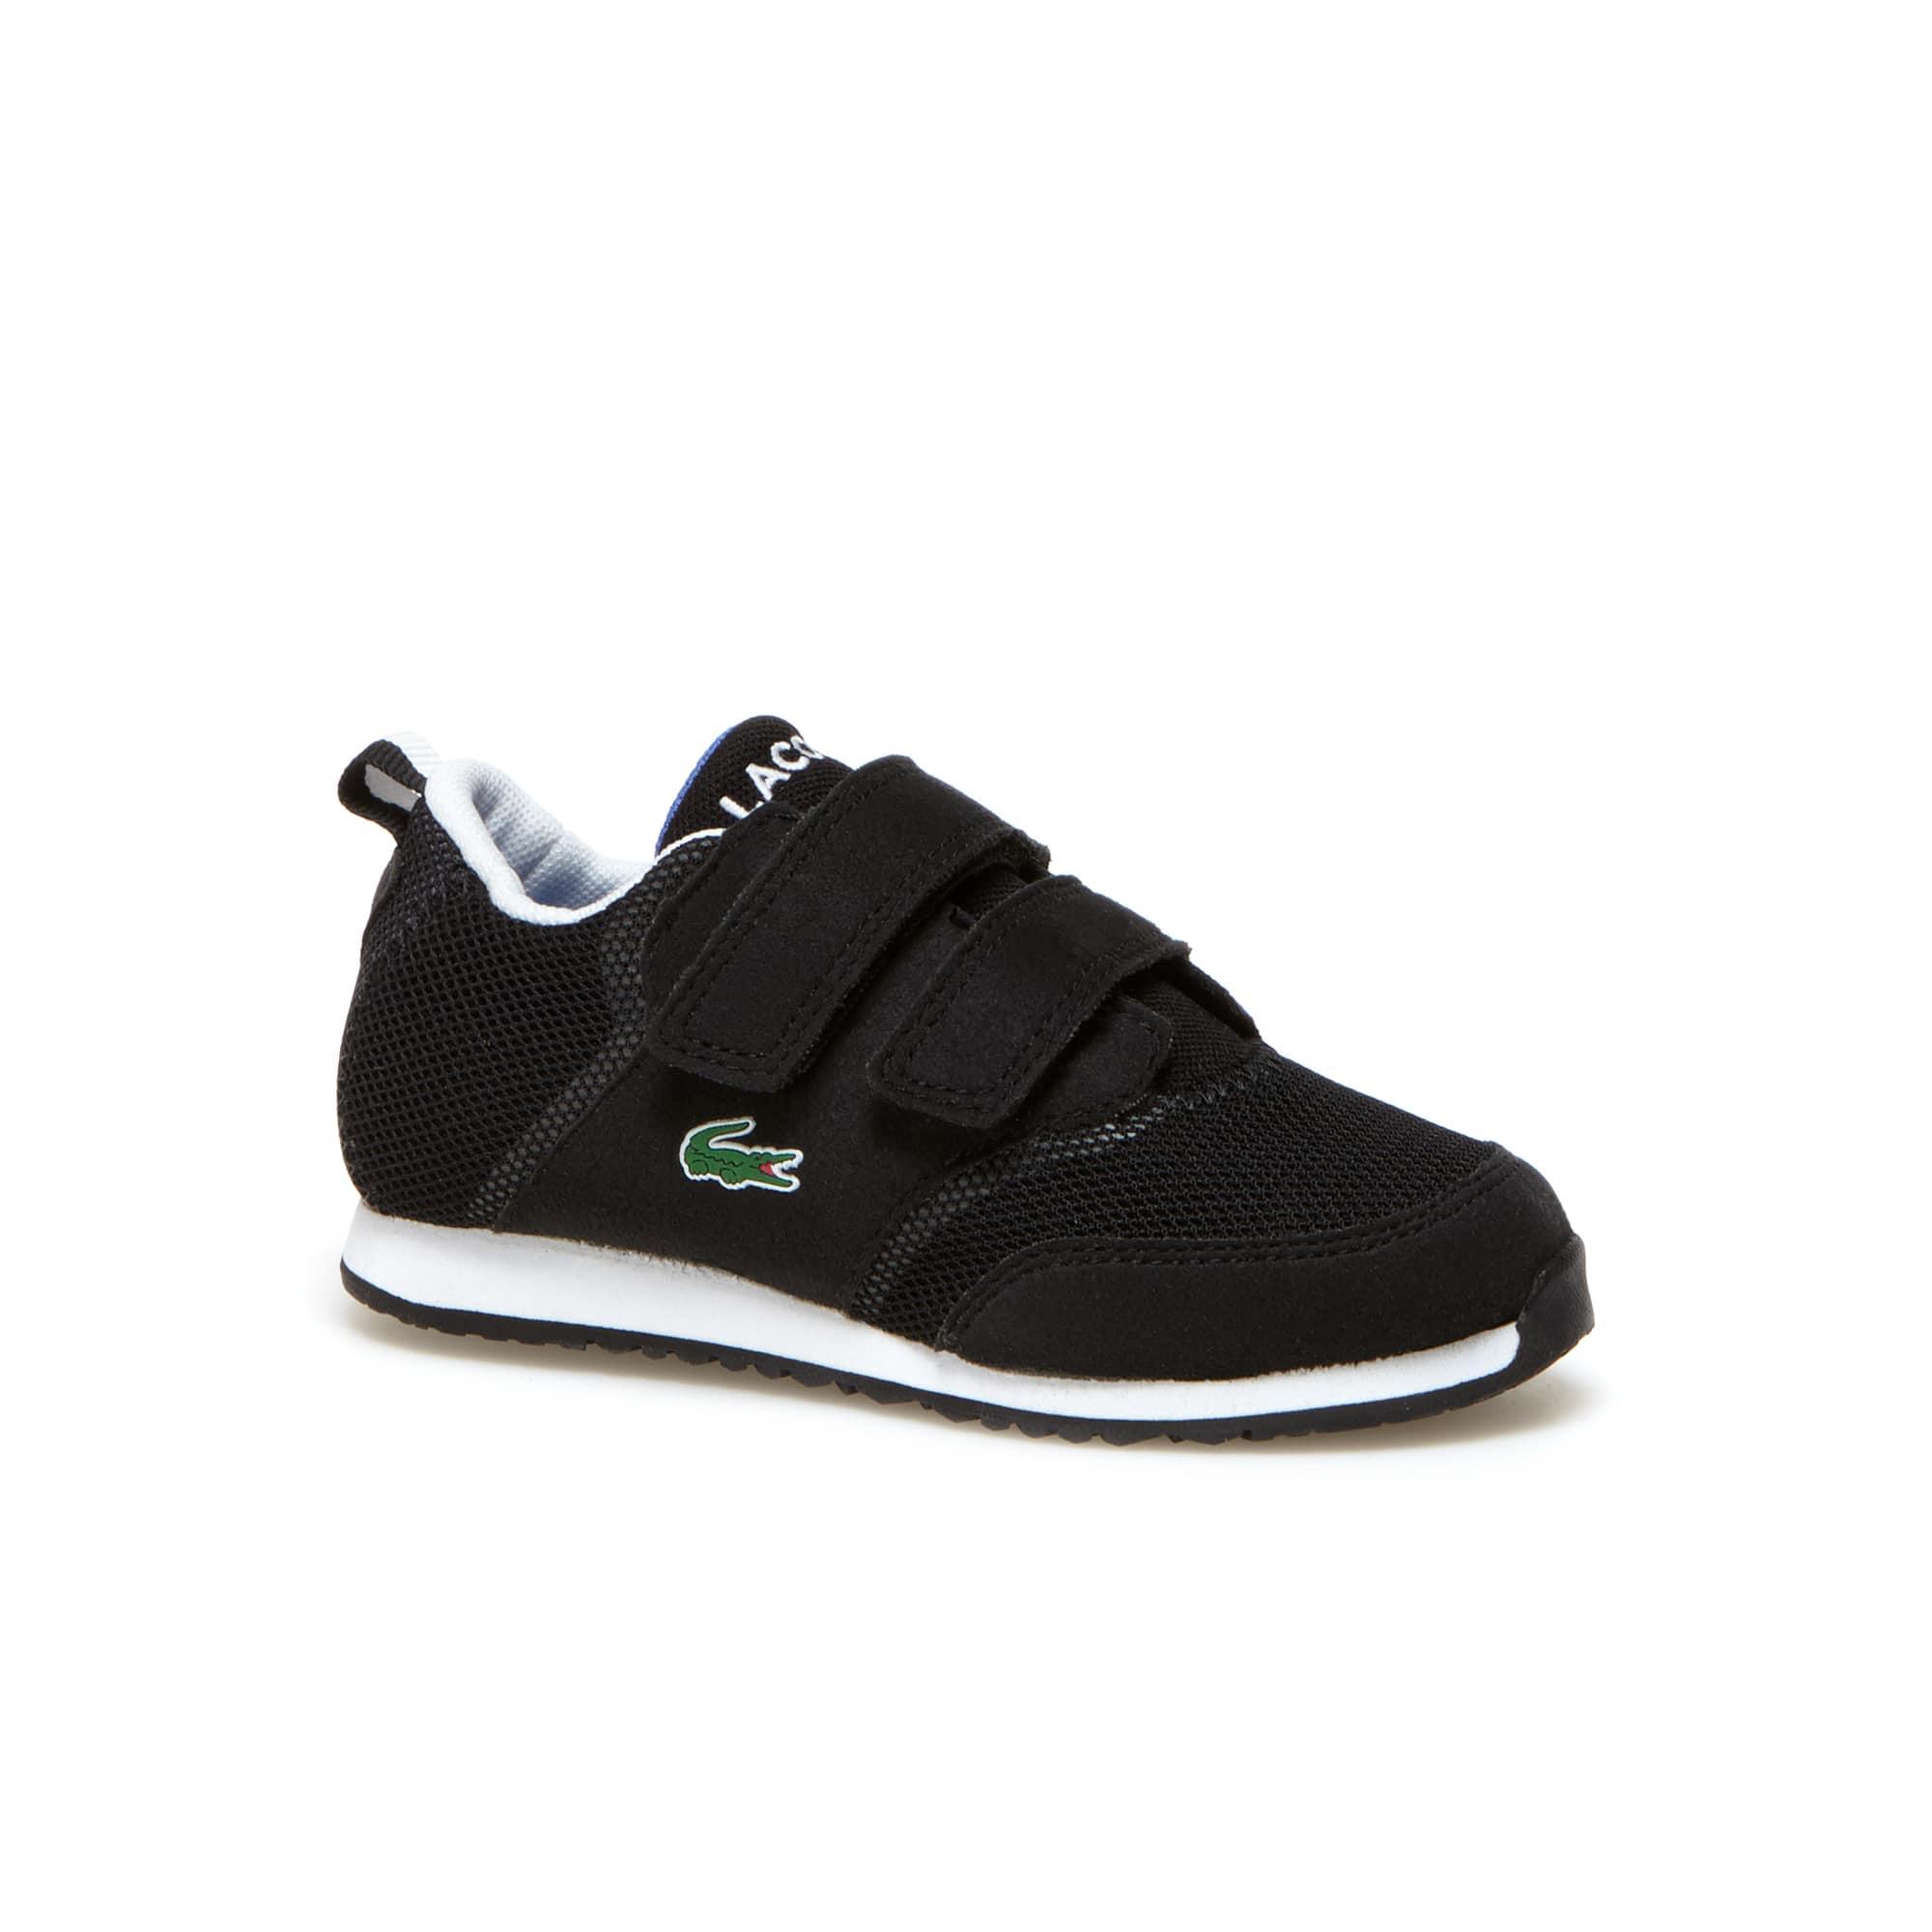 Kids' L.IGHT Breathable Canvas Double Klettverschluss Strap Sneakers